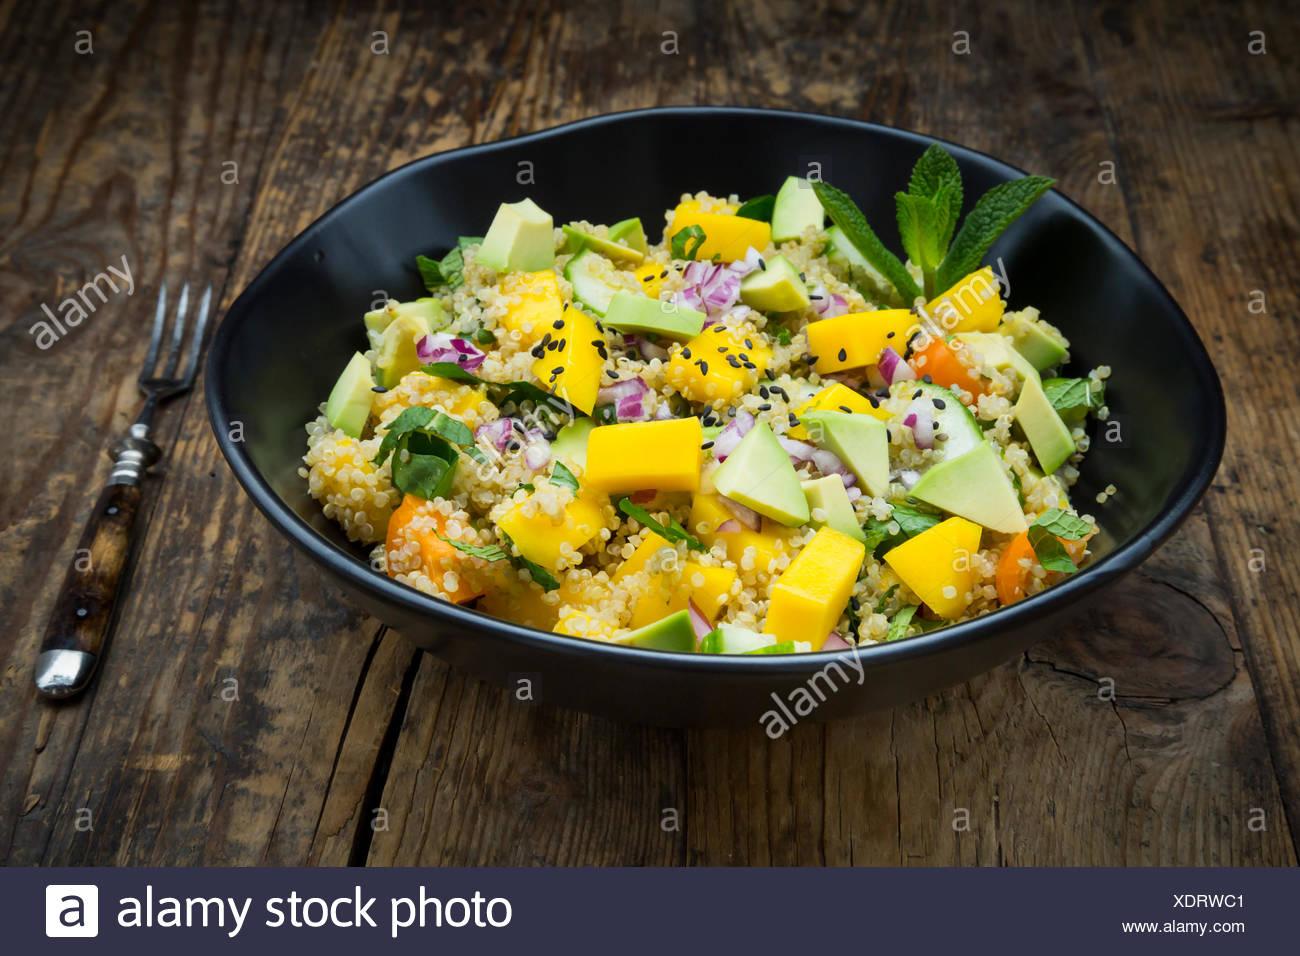 Bowl Of Quinoa Salad With Mango Avocado Tomatoes Cucumber